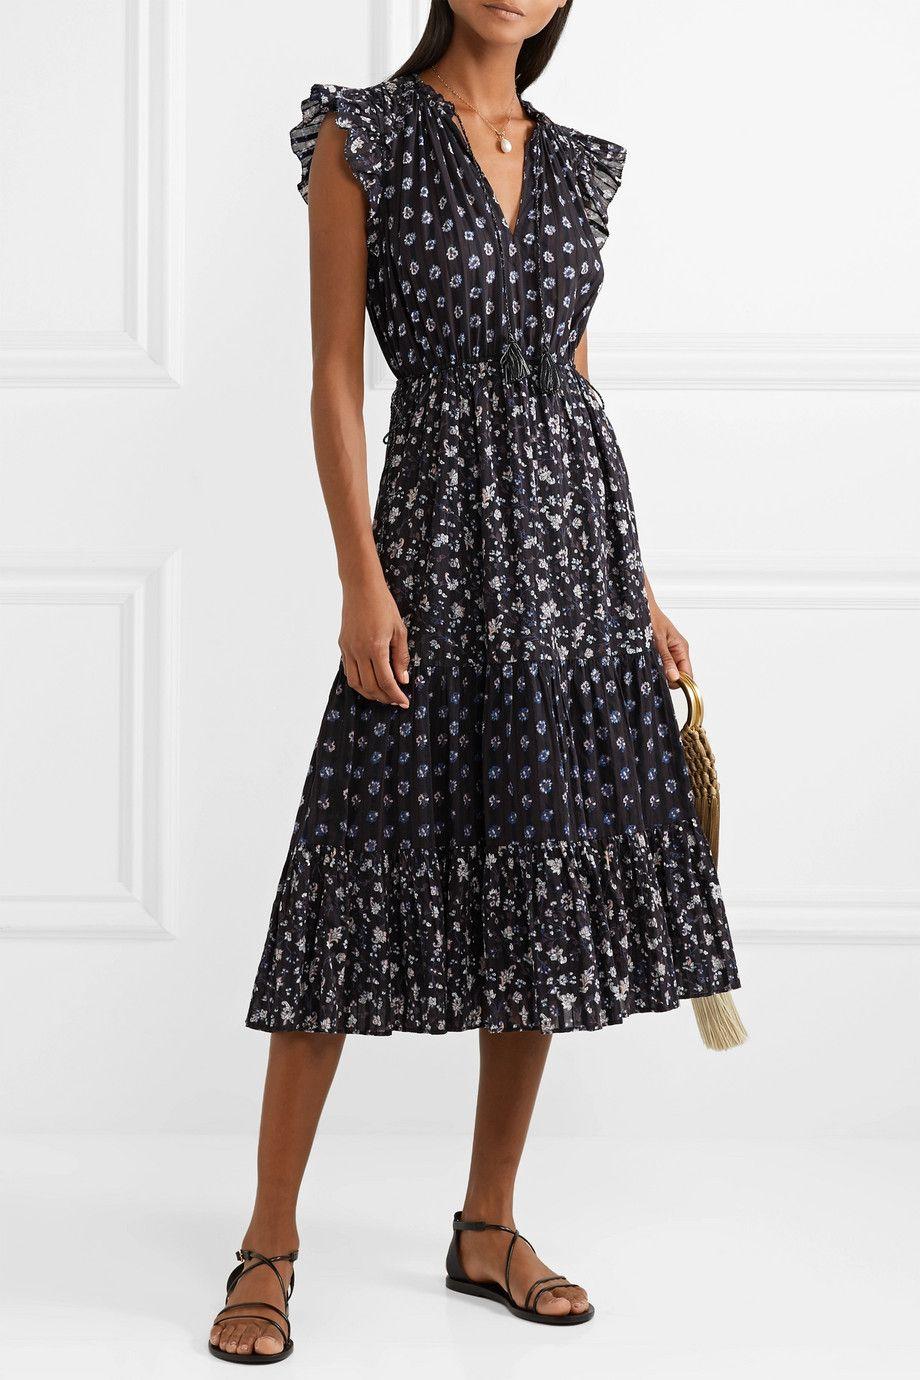 99692854e245 Ulla Johnson | Benita floral-print cotton-gauze midi dress |  NET-A-PORTER.COM